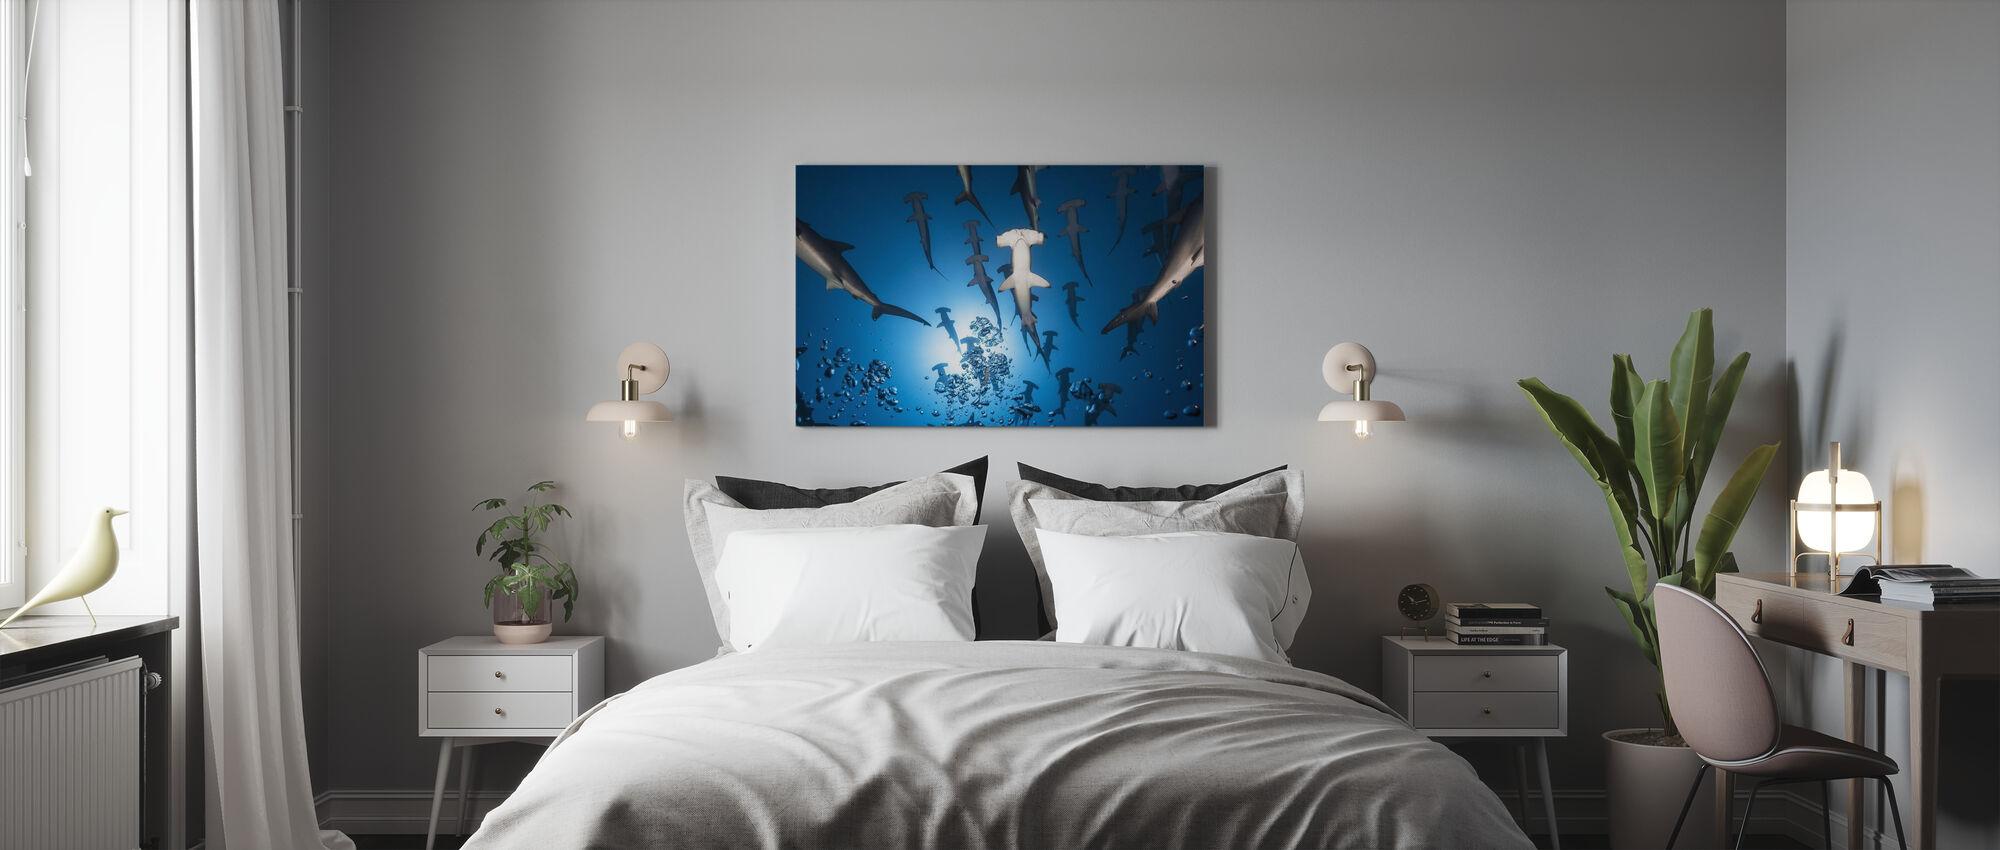 Hammerhead Shark - Canvas print - Bedroom